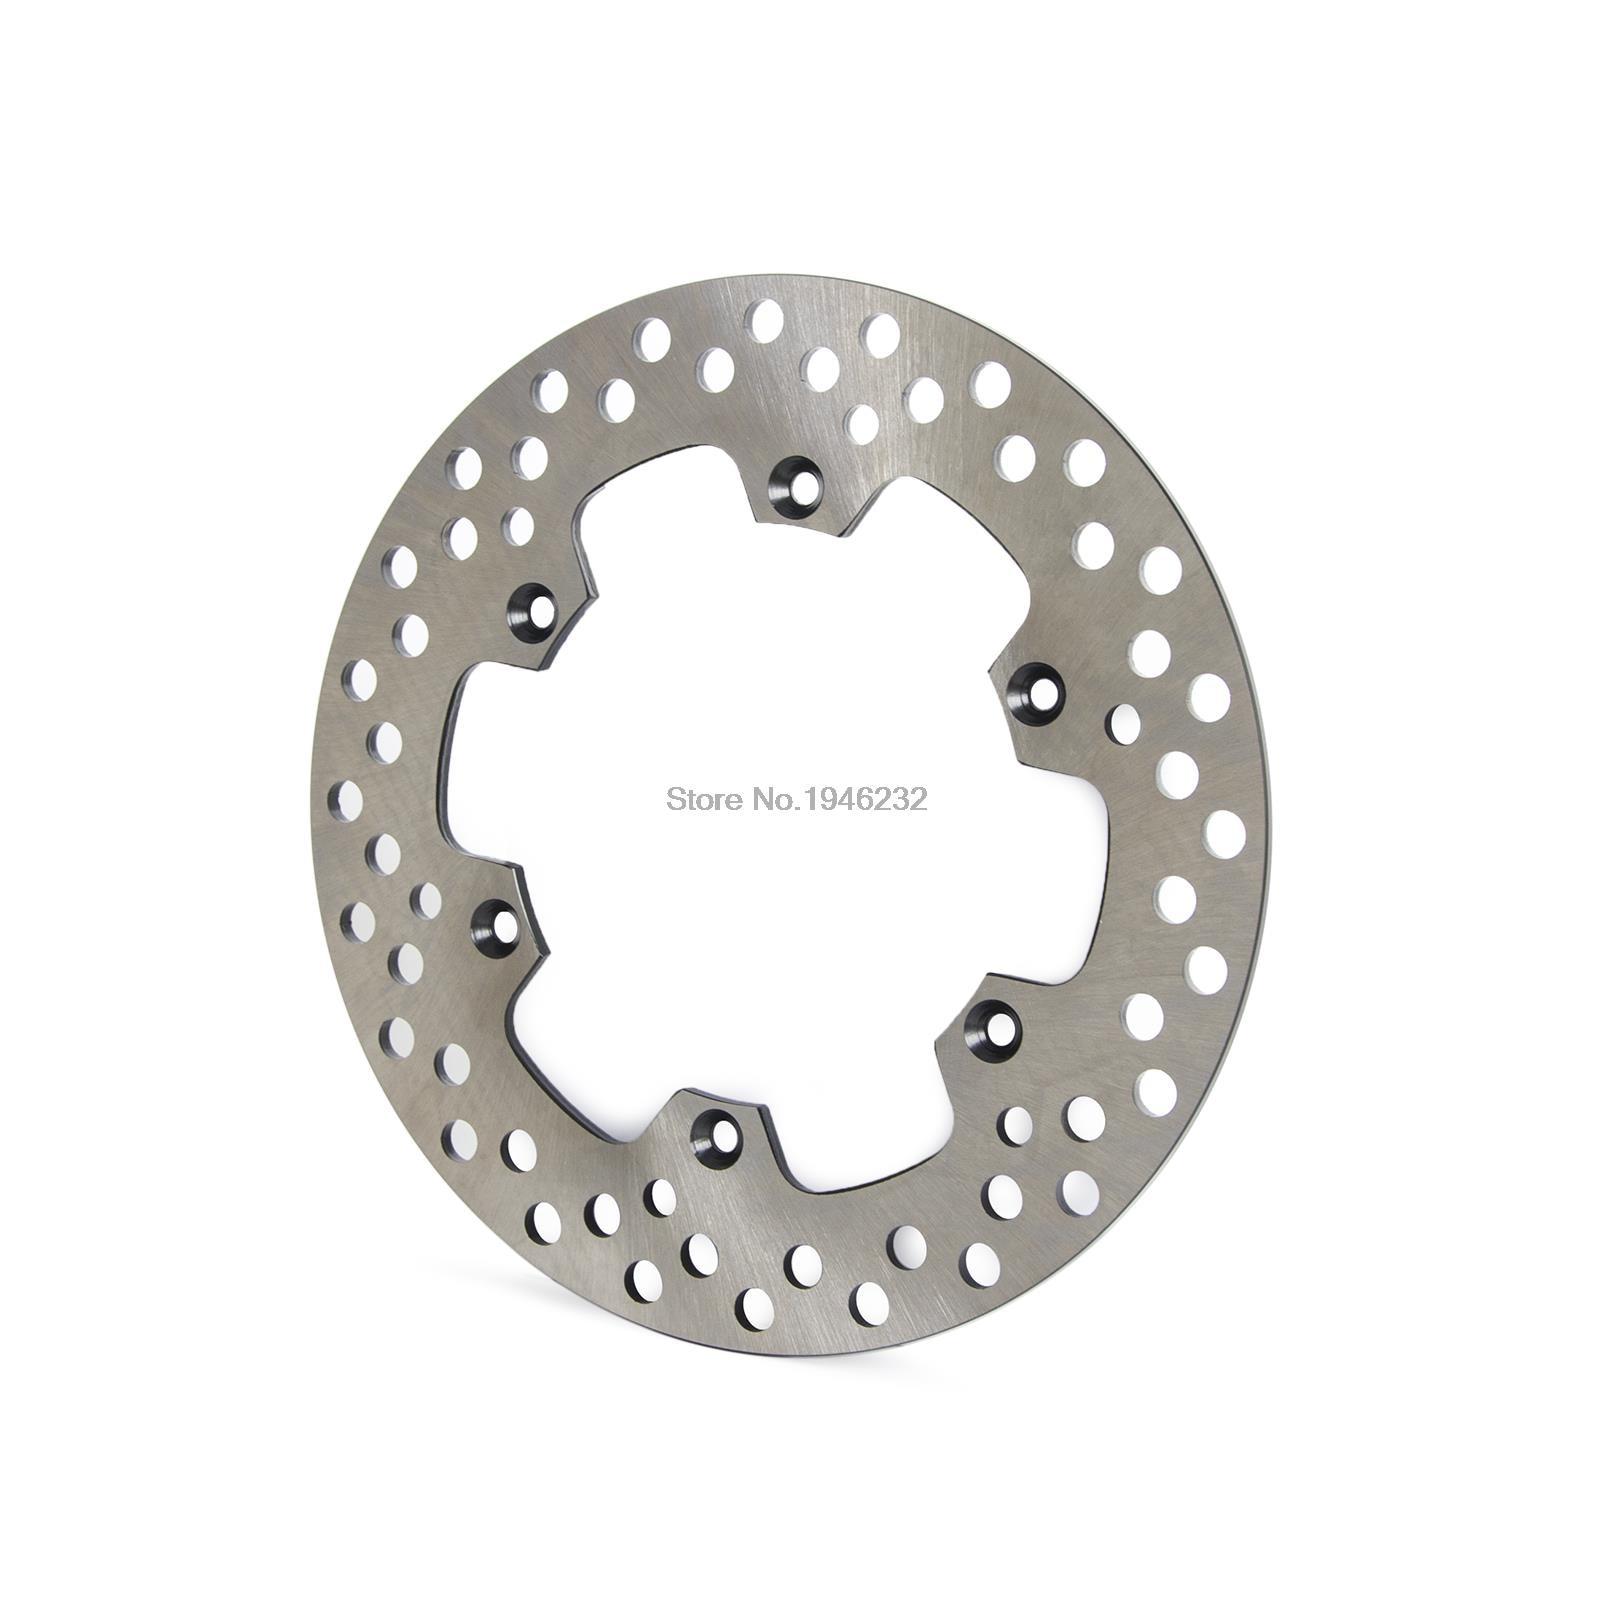 Motorcycle Steel Rear Brake Disc For Suzuki DR 125 SMK8/SMK9/SML0 08-12 motobike front disks sintered copper fa185 motorcycle brake pads for suzuki dr 125 smk8 smk9 sml0 08 11